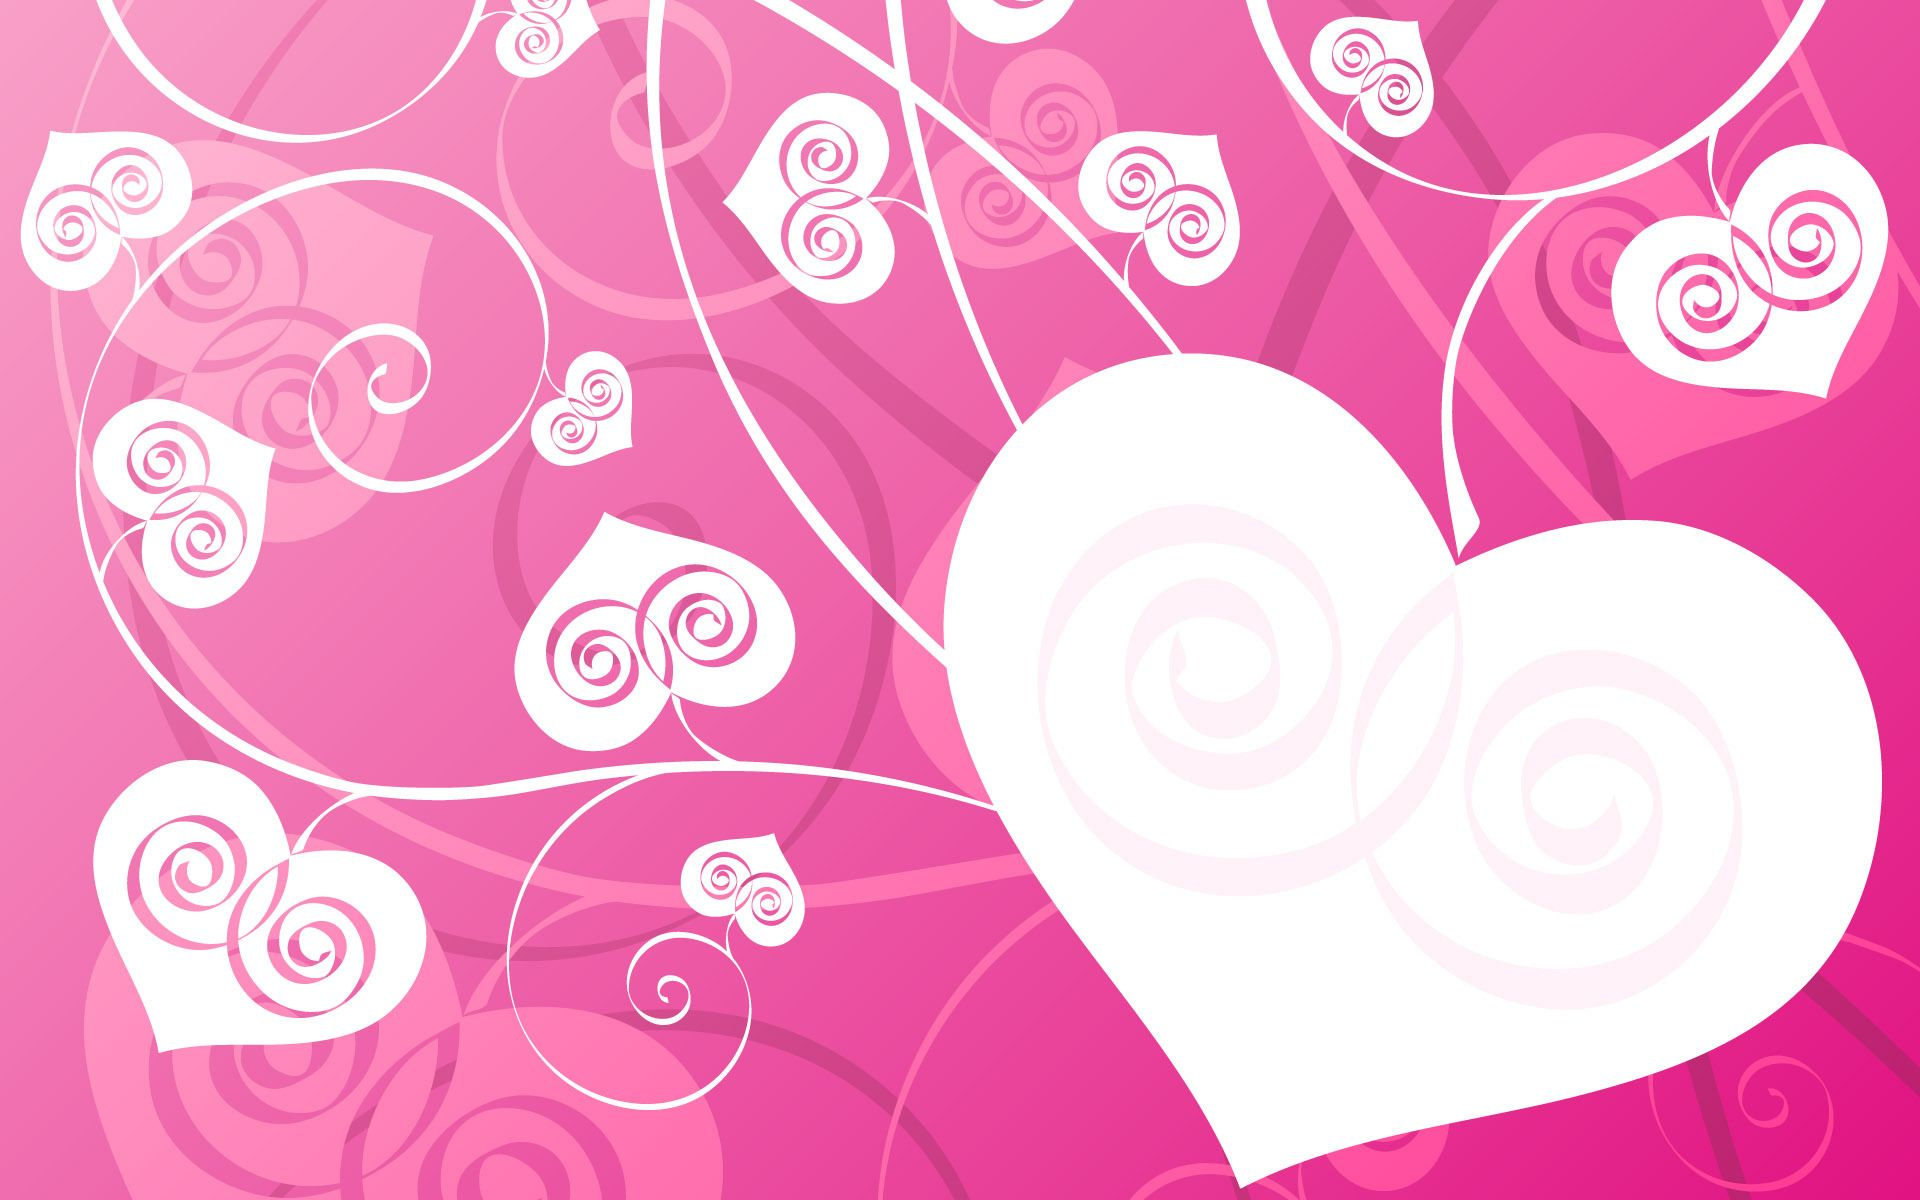 heart, love, white, pink, vines   ♥♥~hearts~♥♥   pinterest